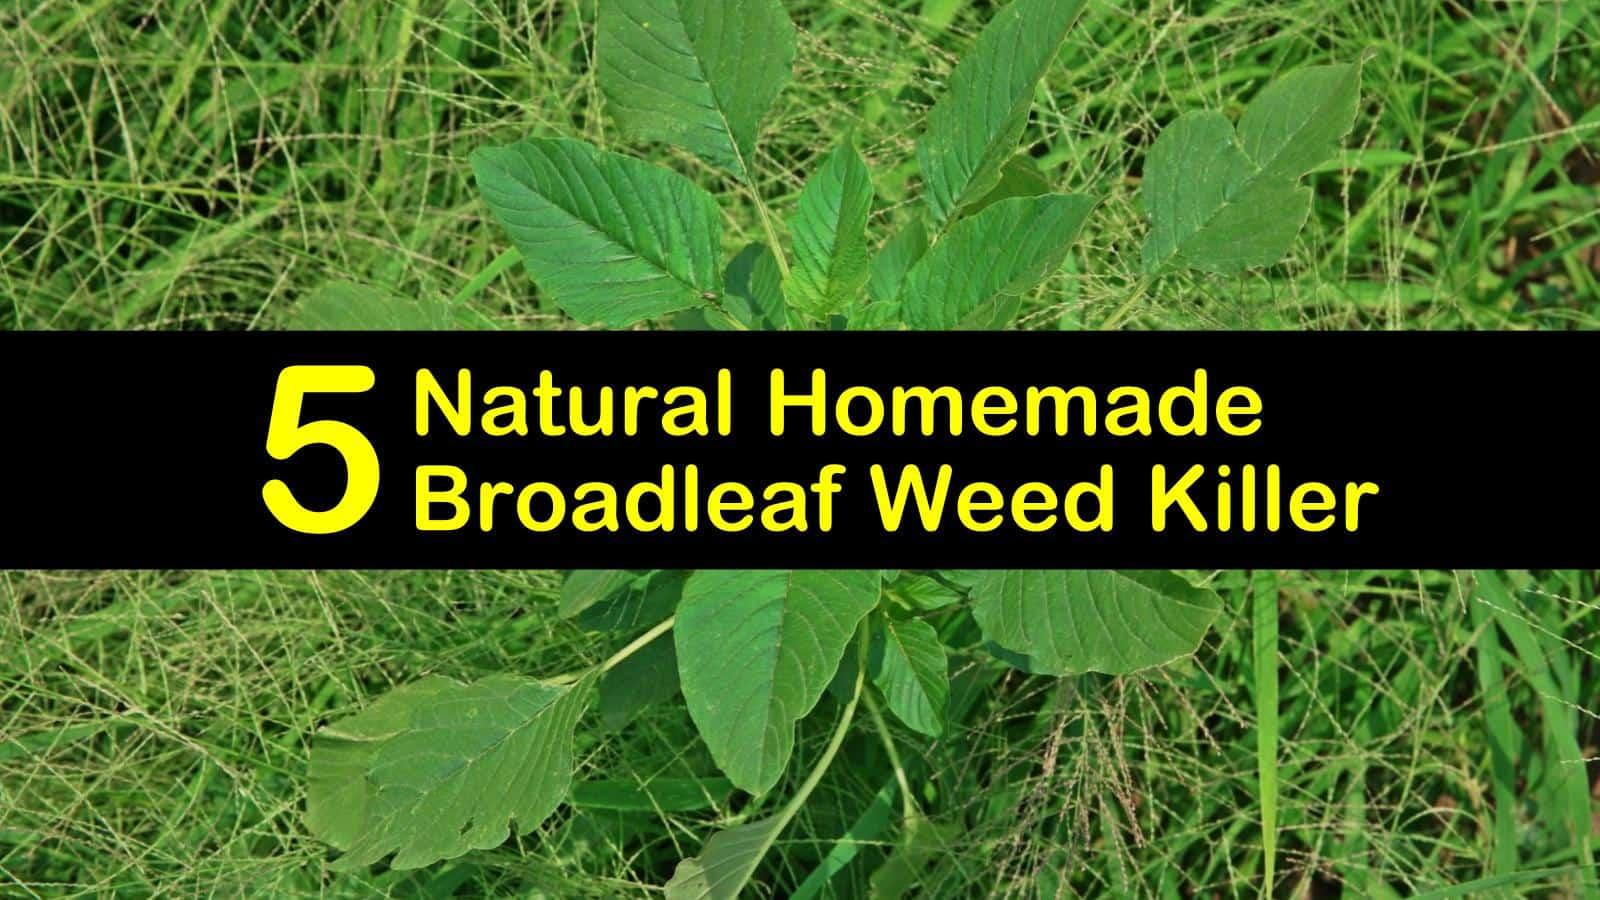 homemade broadleaf weed killer titleimg1